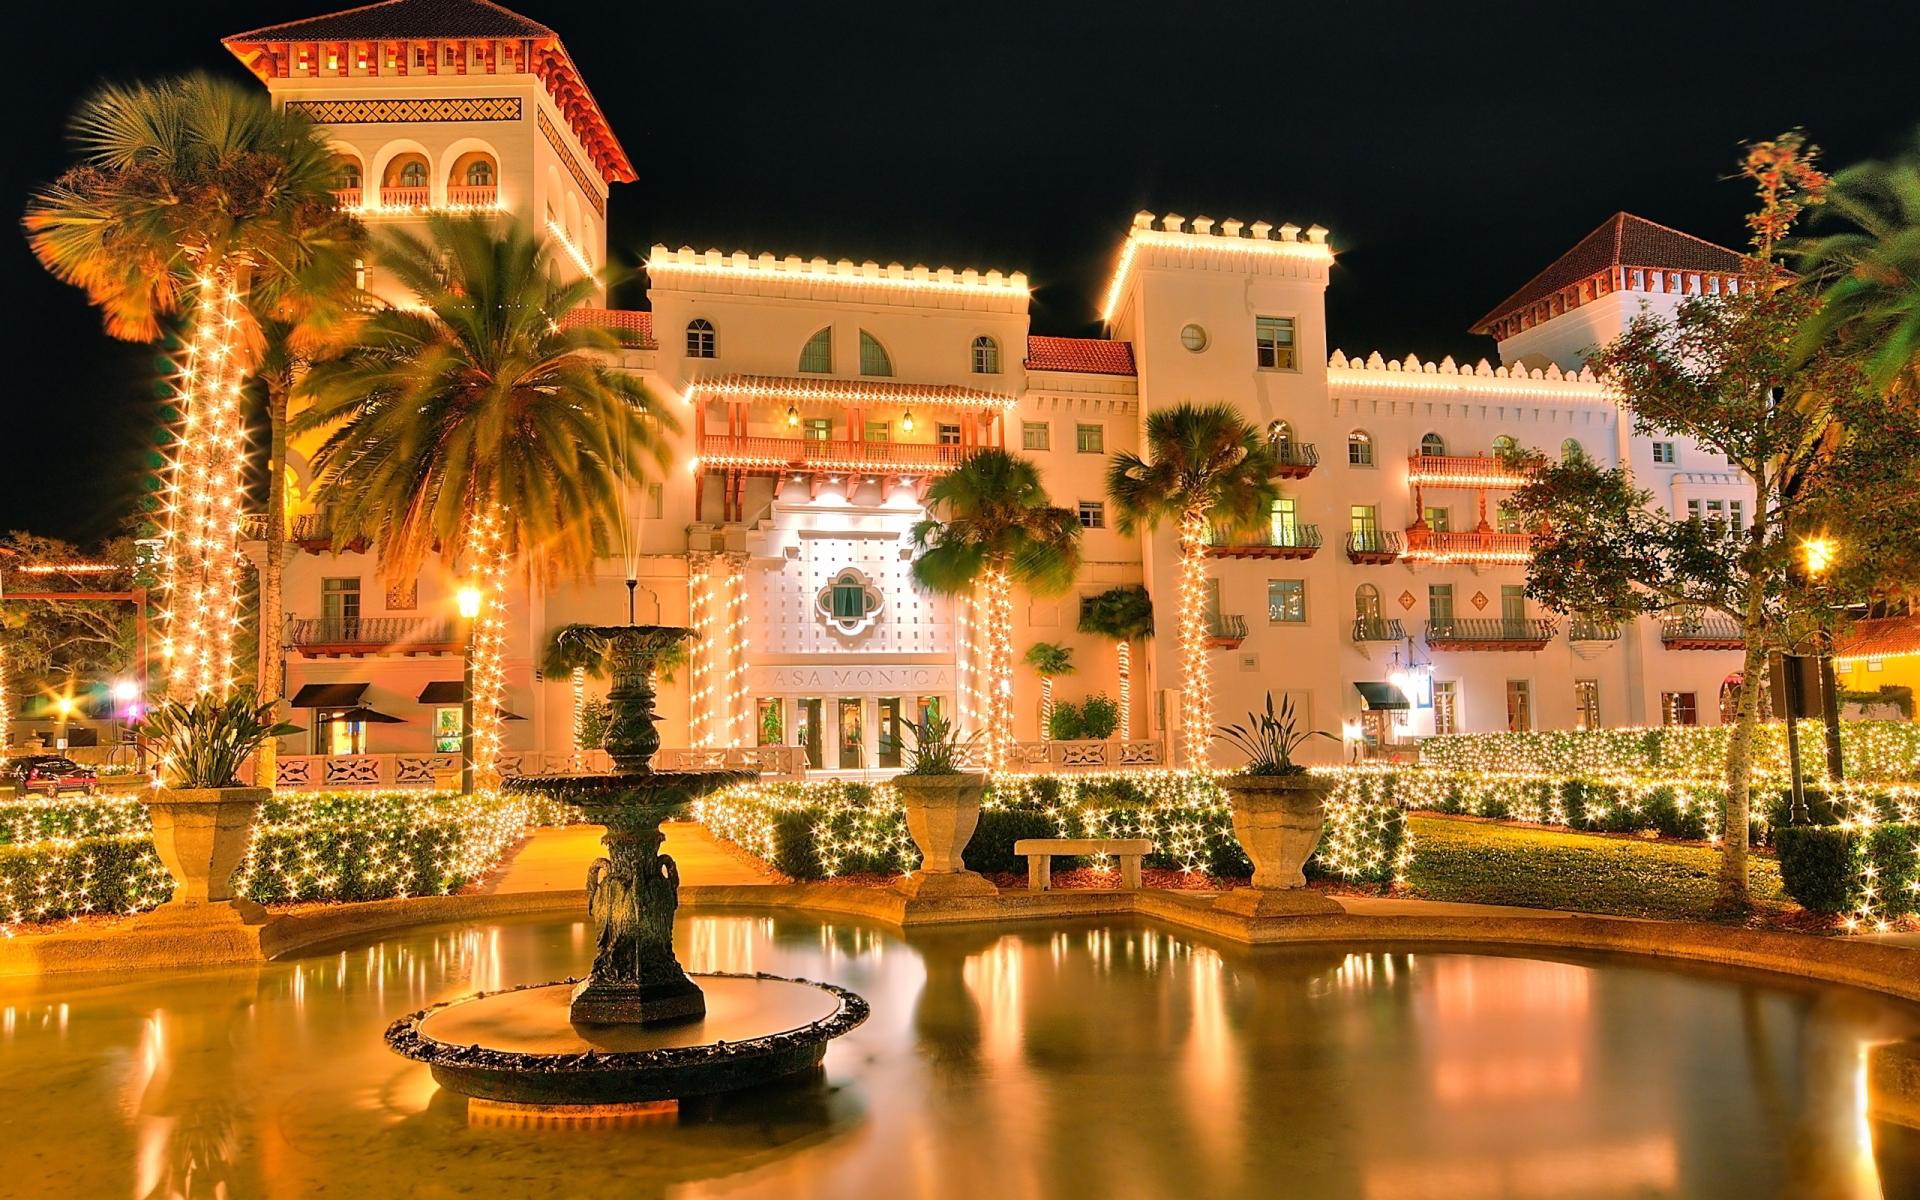 Mansion House Casino